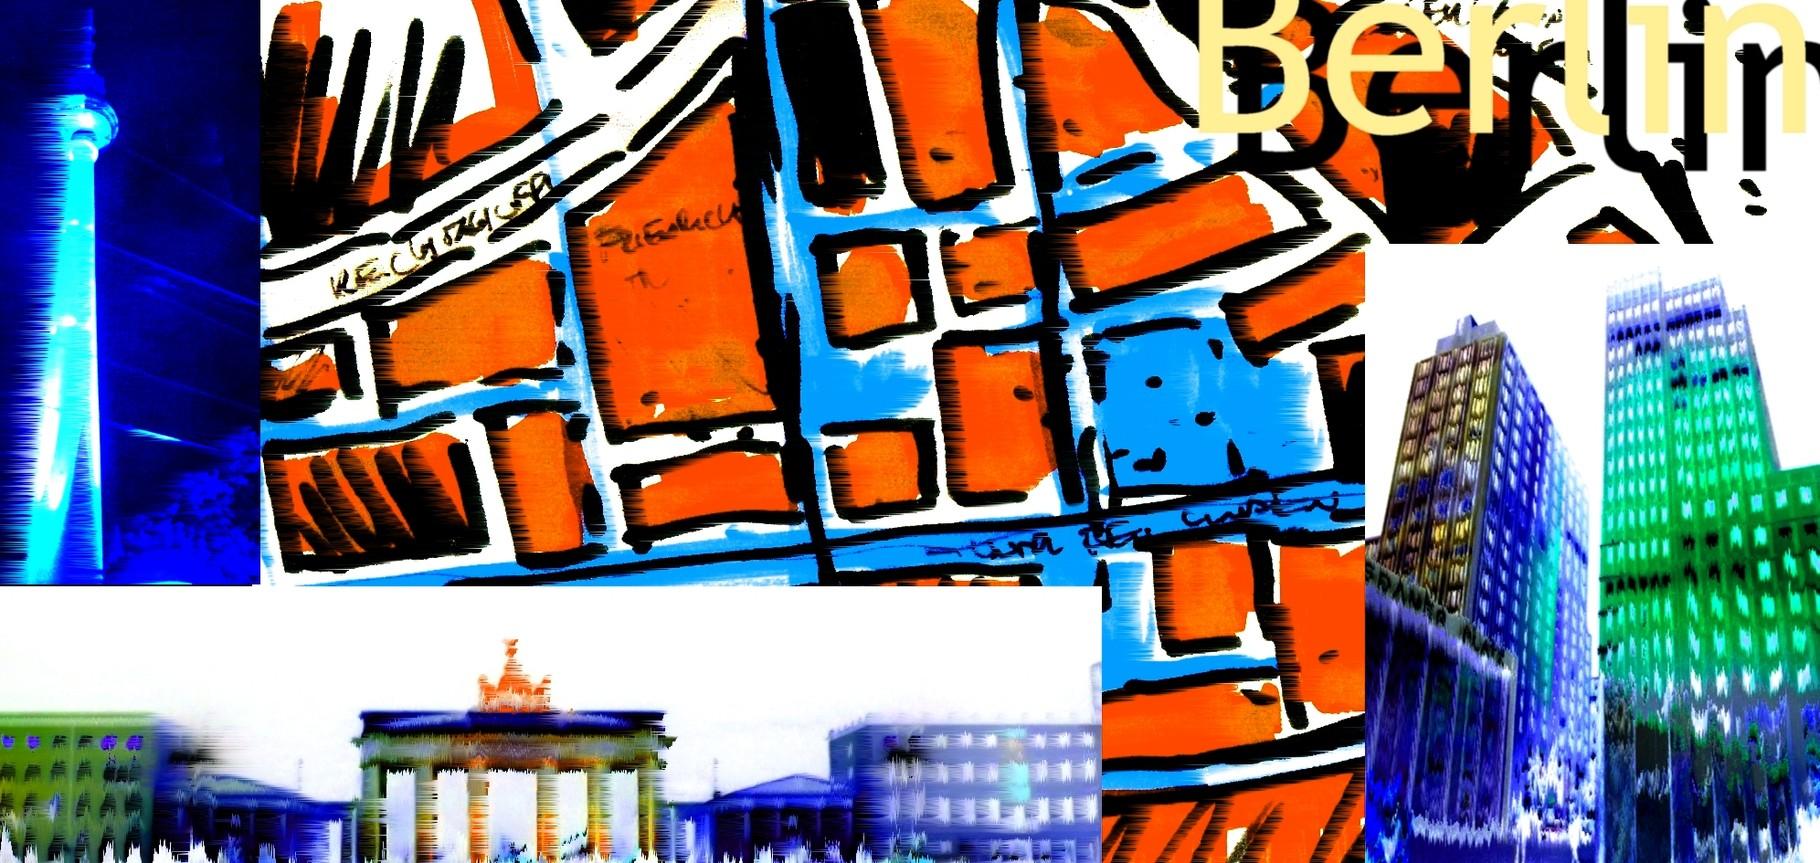 Berlin 3, 2013